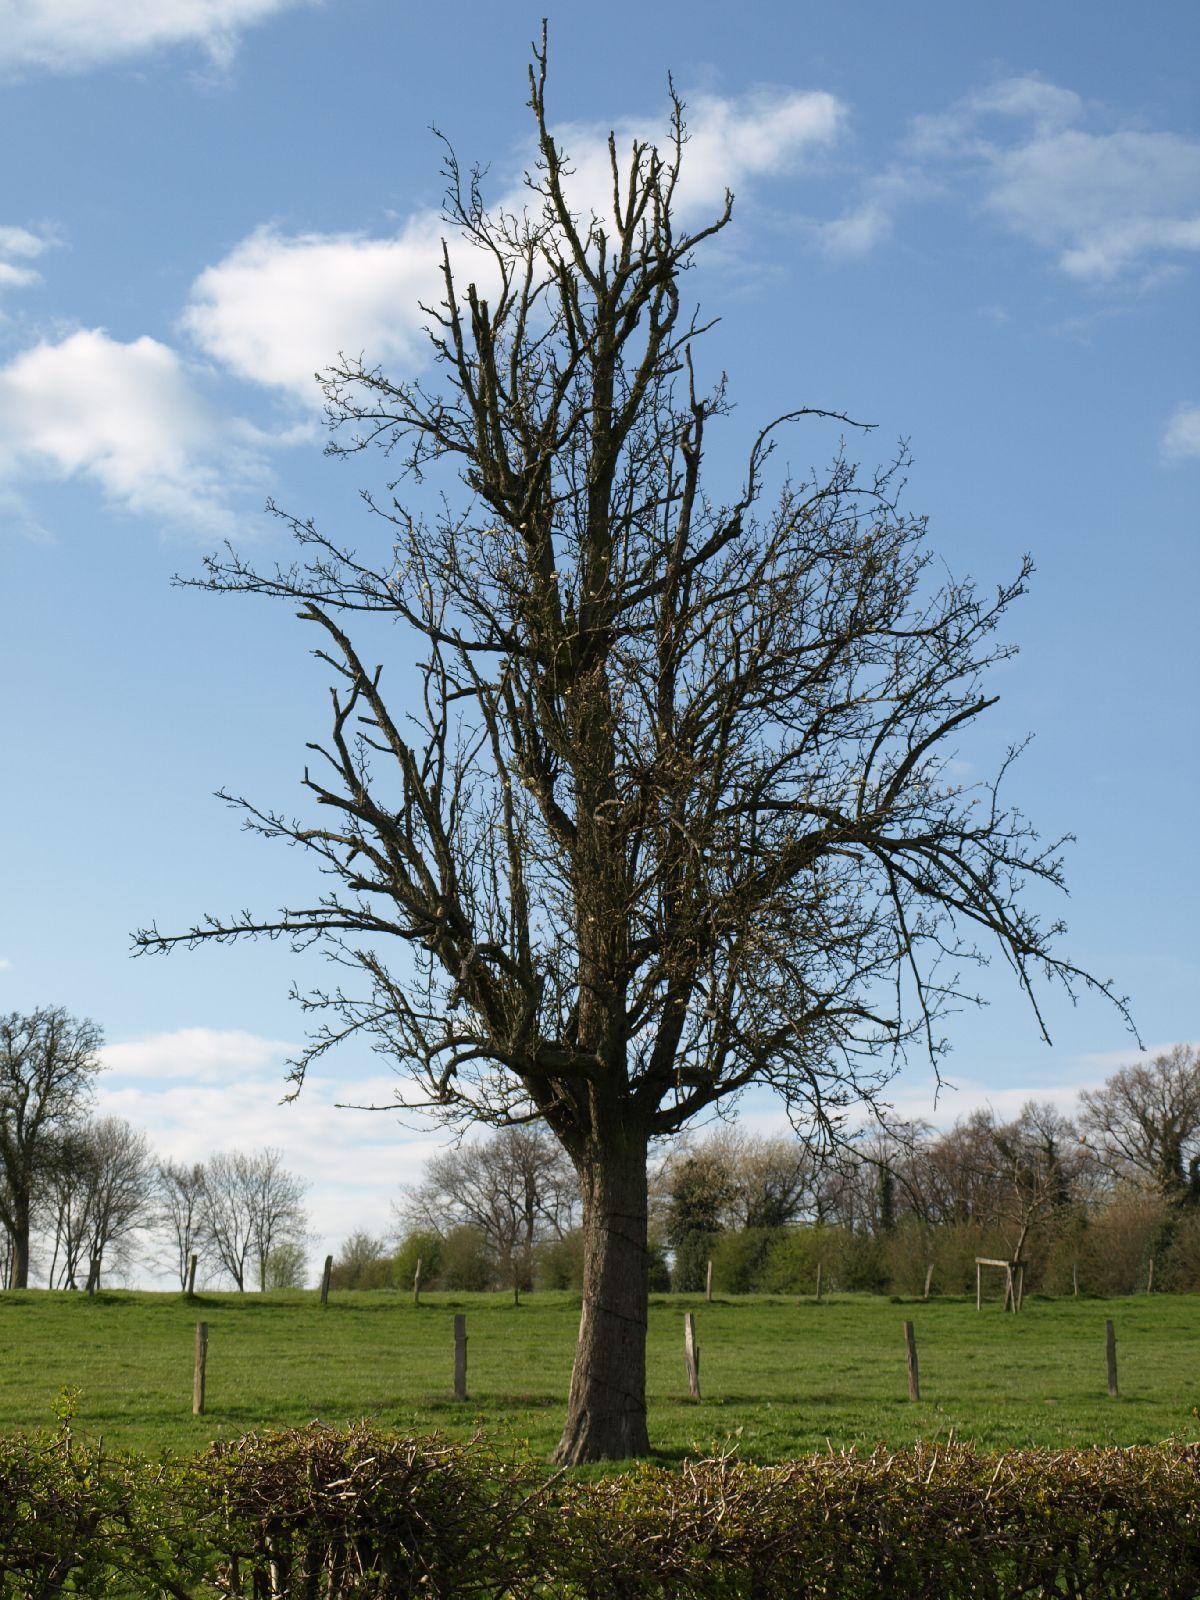 Pflanzen-Baum-Silhouette-Foto_Textur_B_P4201543